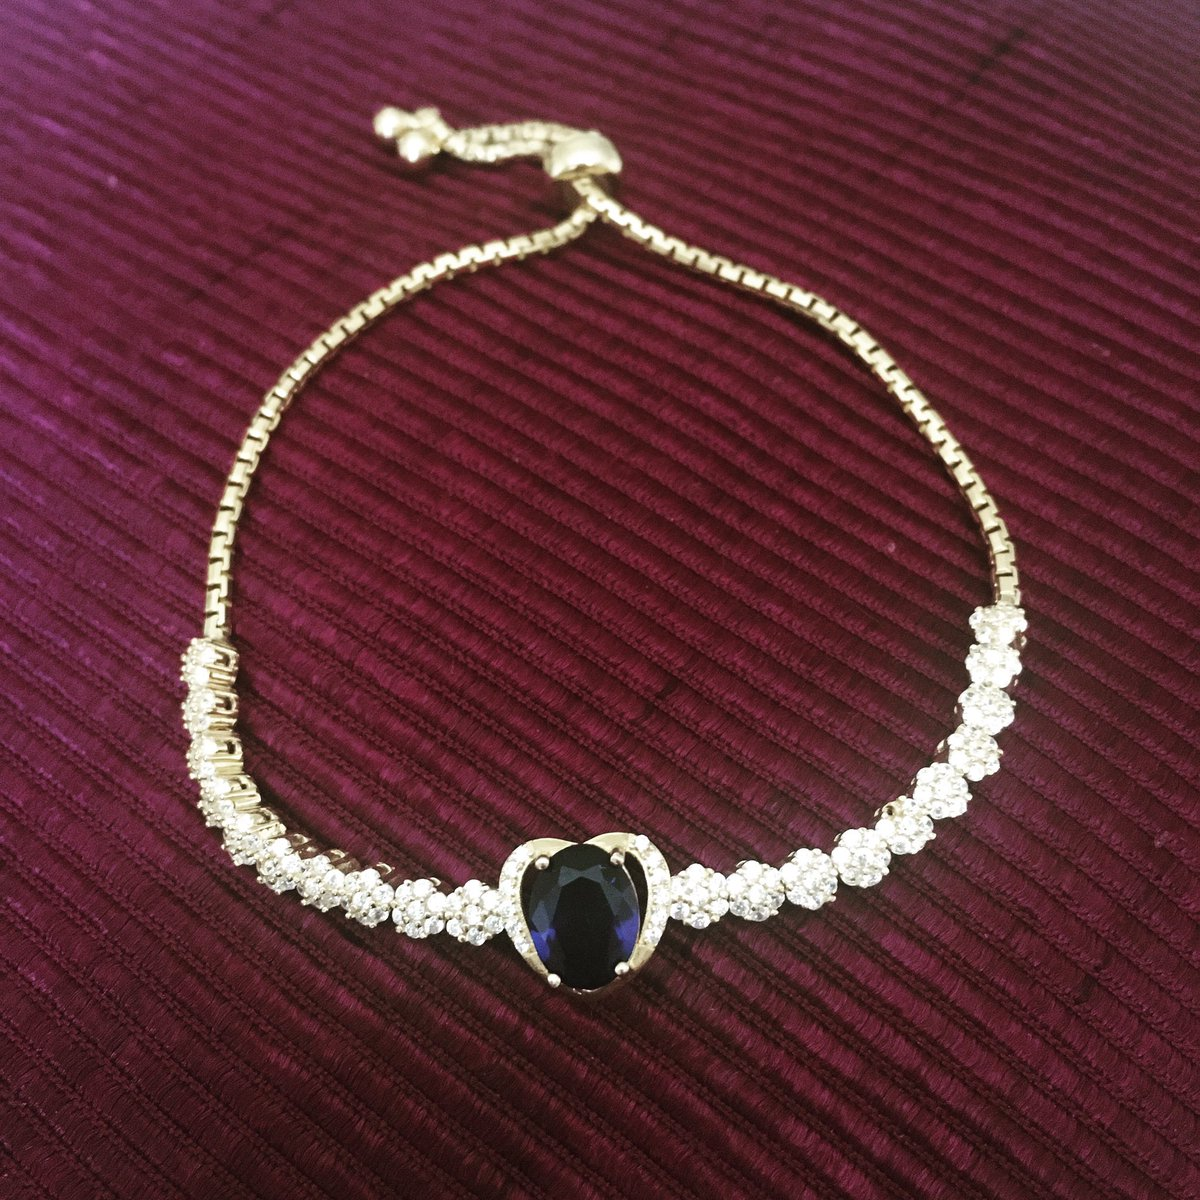 Gold polish sterling silver bracelet. DM for more info  Shop: http://www.mbercollection.com  #cuffbracelet #silvercuffbracelet #jewelrytrend #style #silverjewelry #jewelry #beautifuljewelry #jewelrylovers #bridesmaids #girlsjewelry #jewelryaddict #jewelryoftheday #ilovejewellerypic.twitter.com/EToegJMyCD